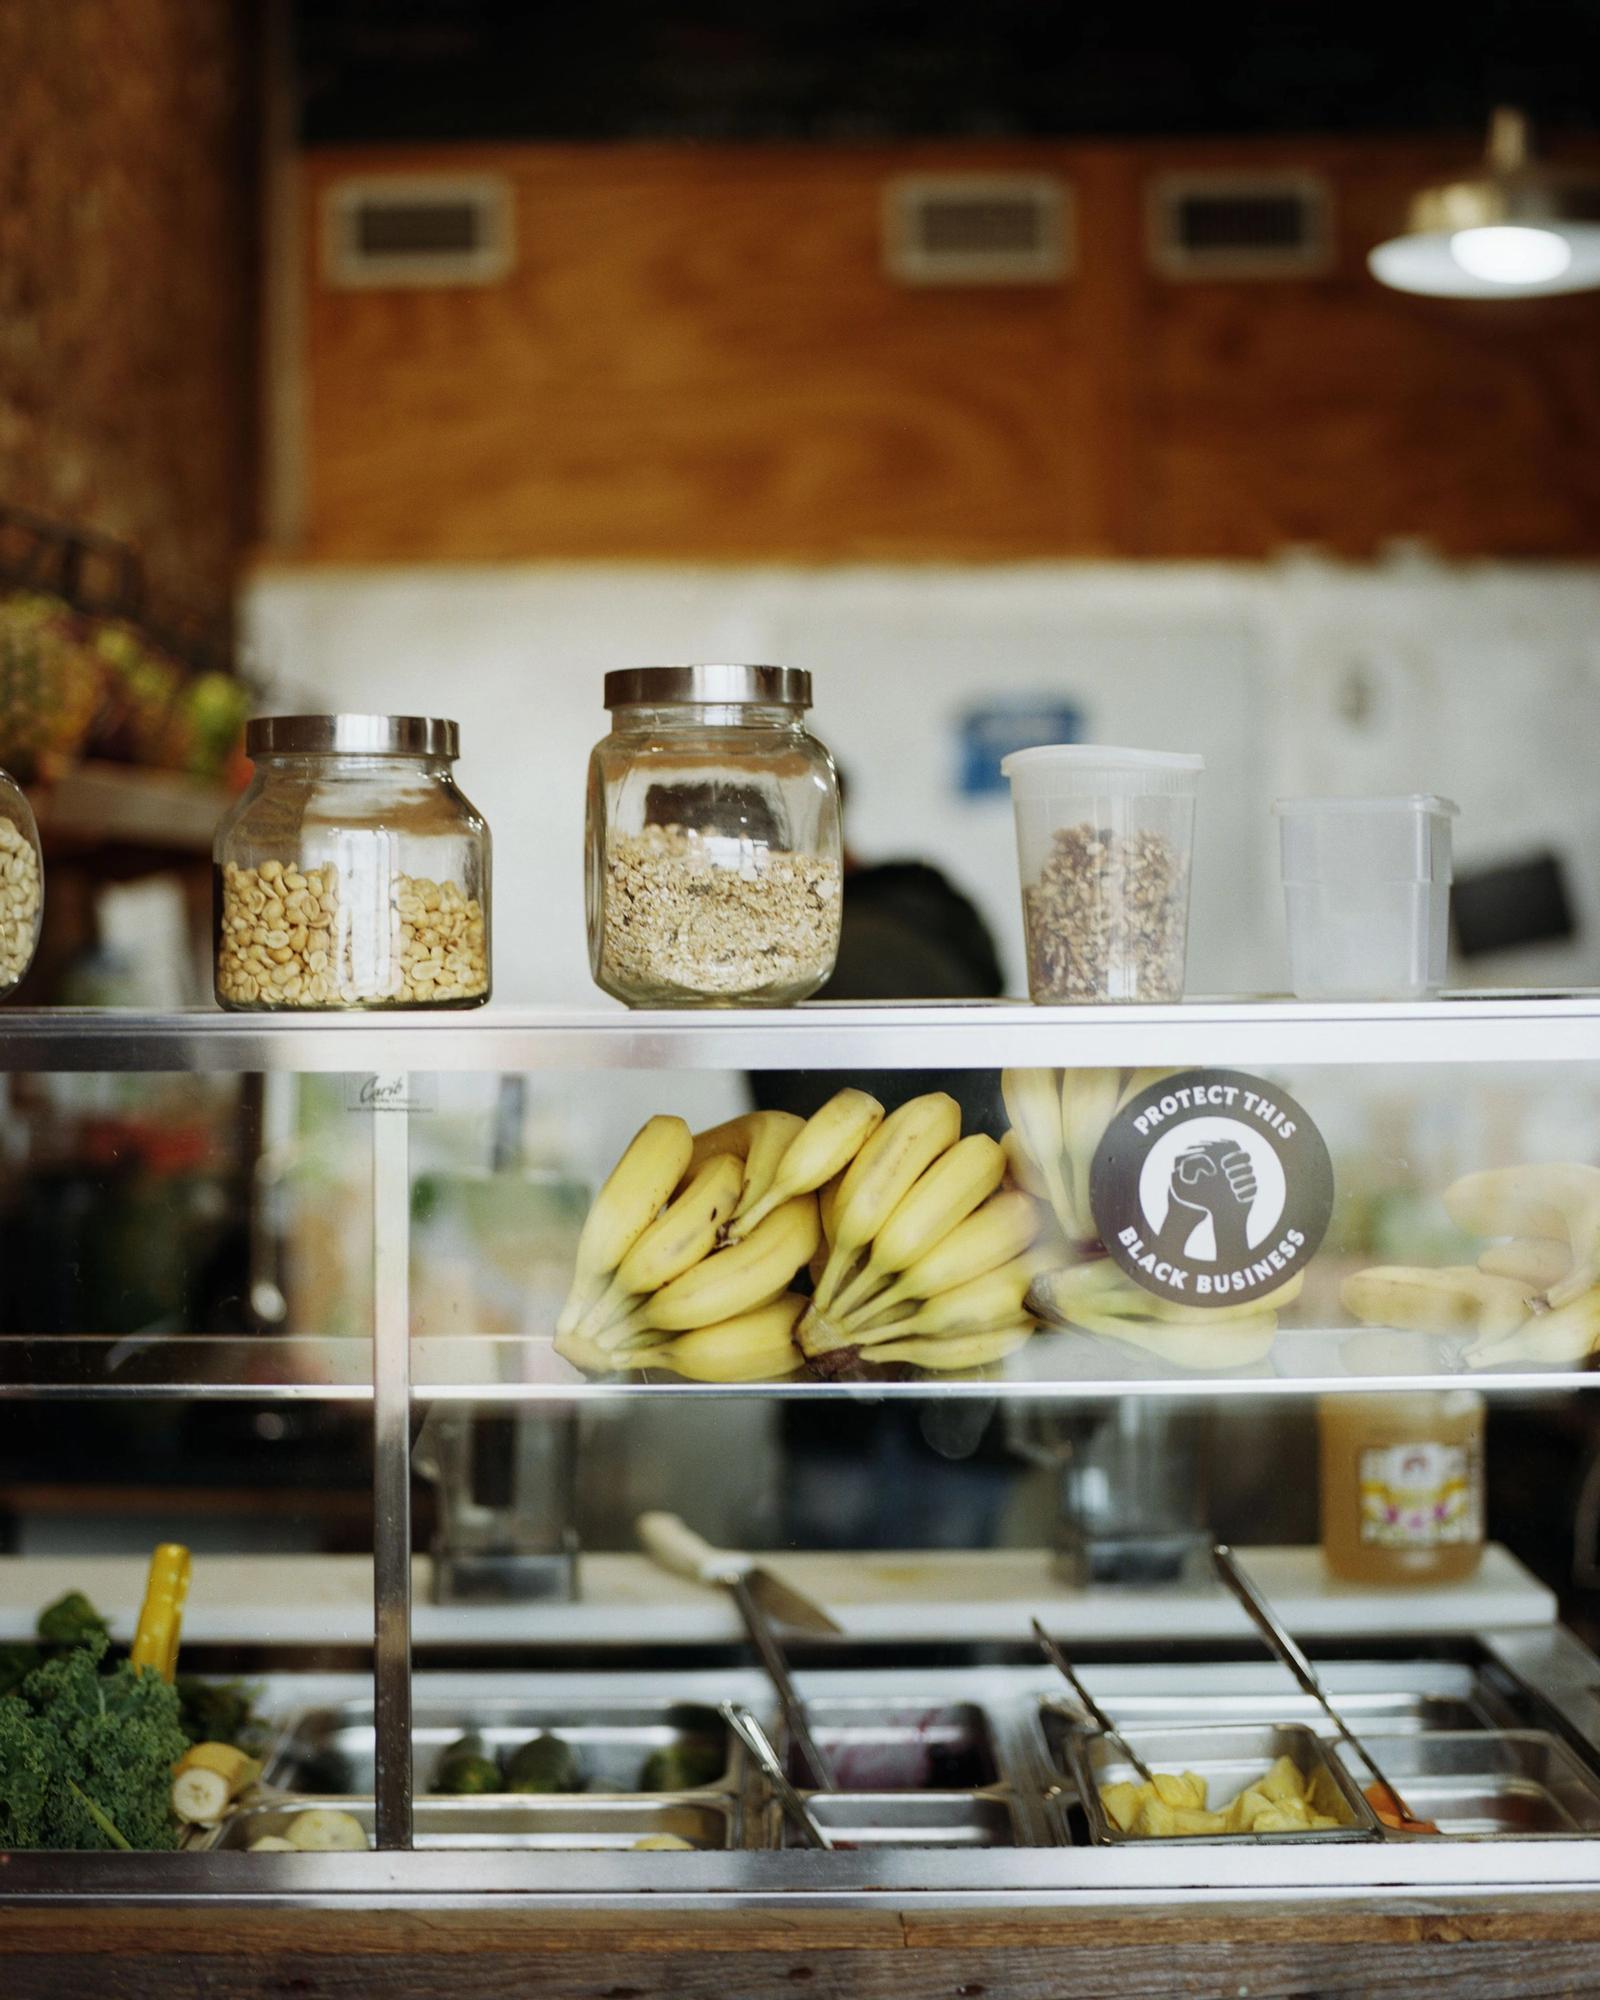 Grains and bananas artfully arranged on shelves.